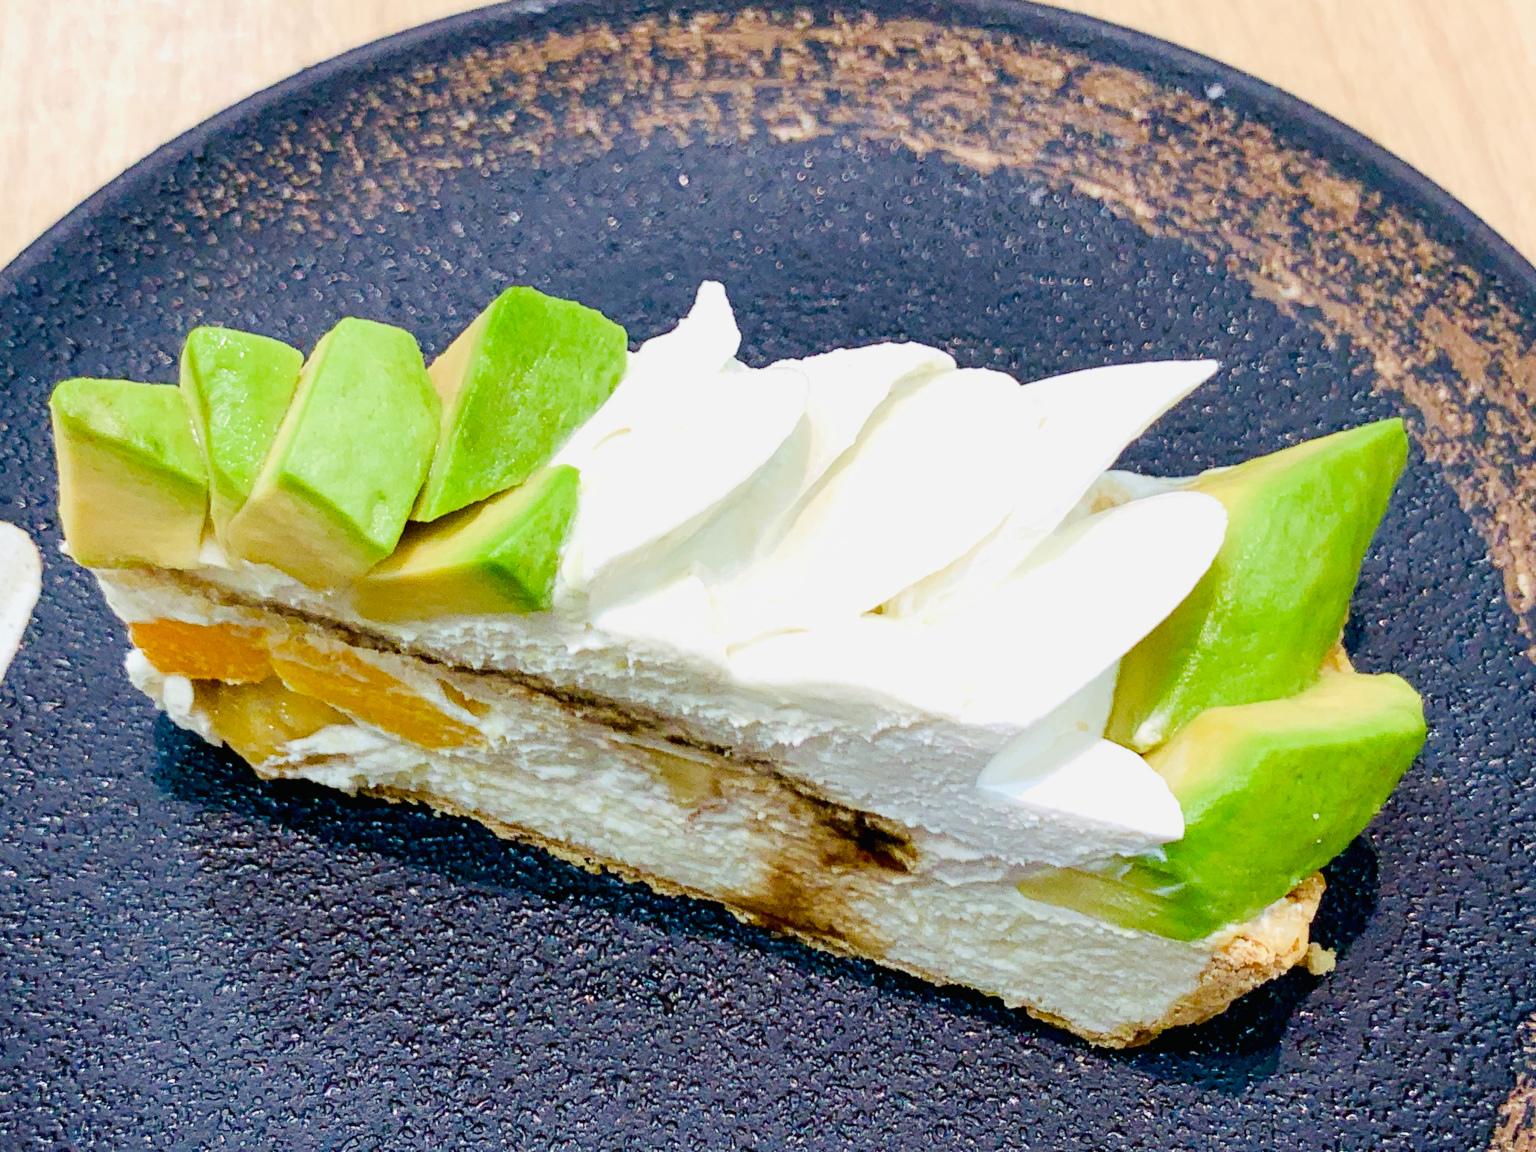 Avocado Tiramisu Cake: Japan's newest must-try dessert